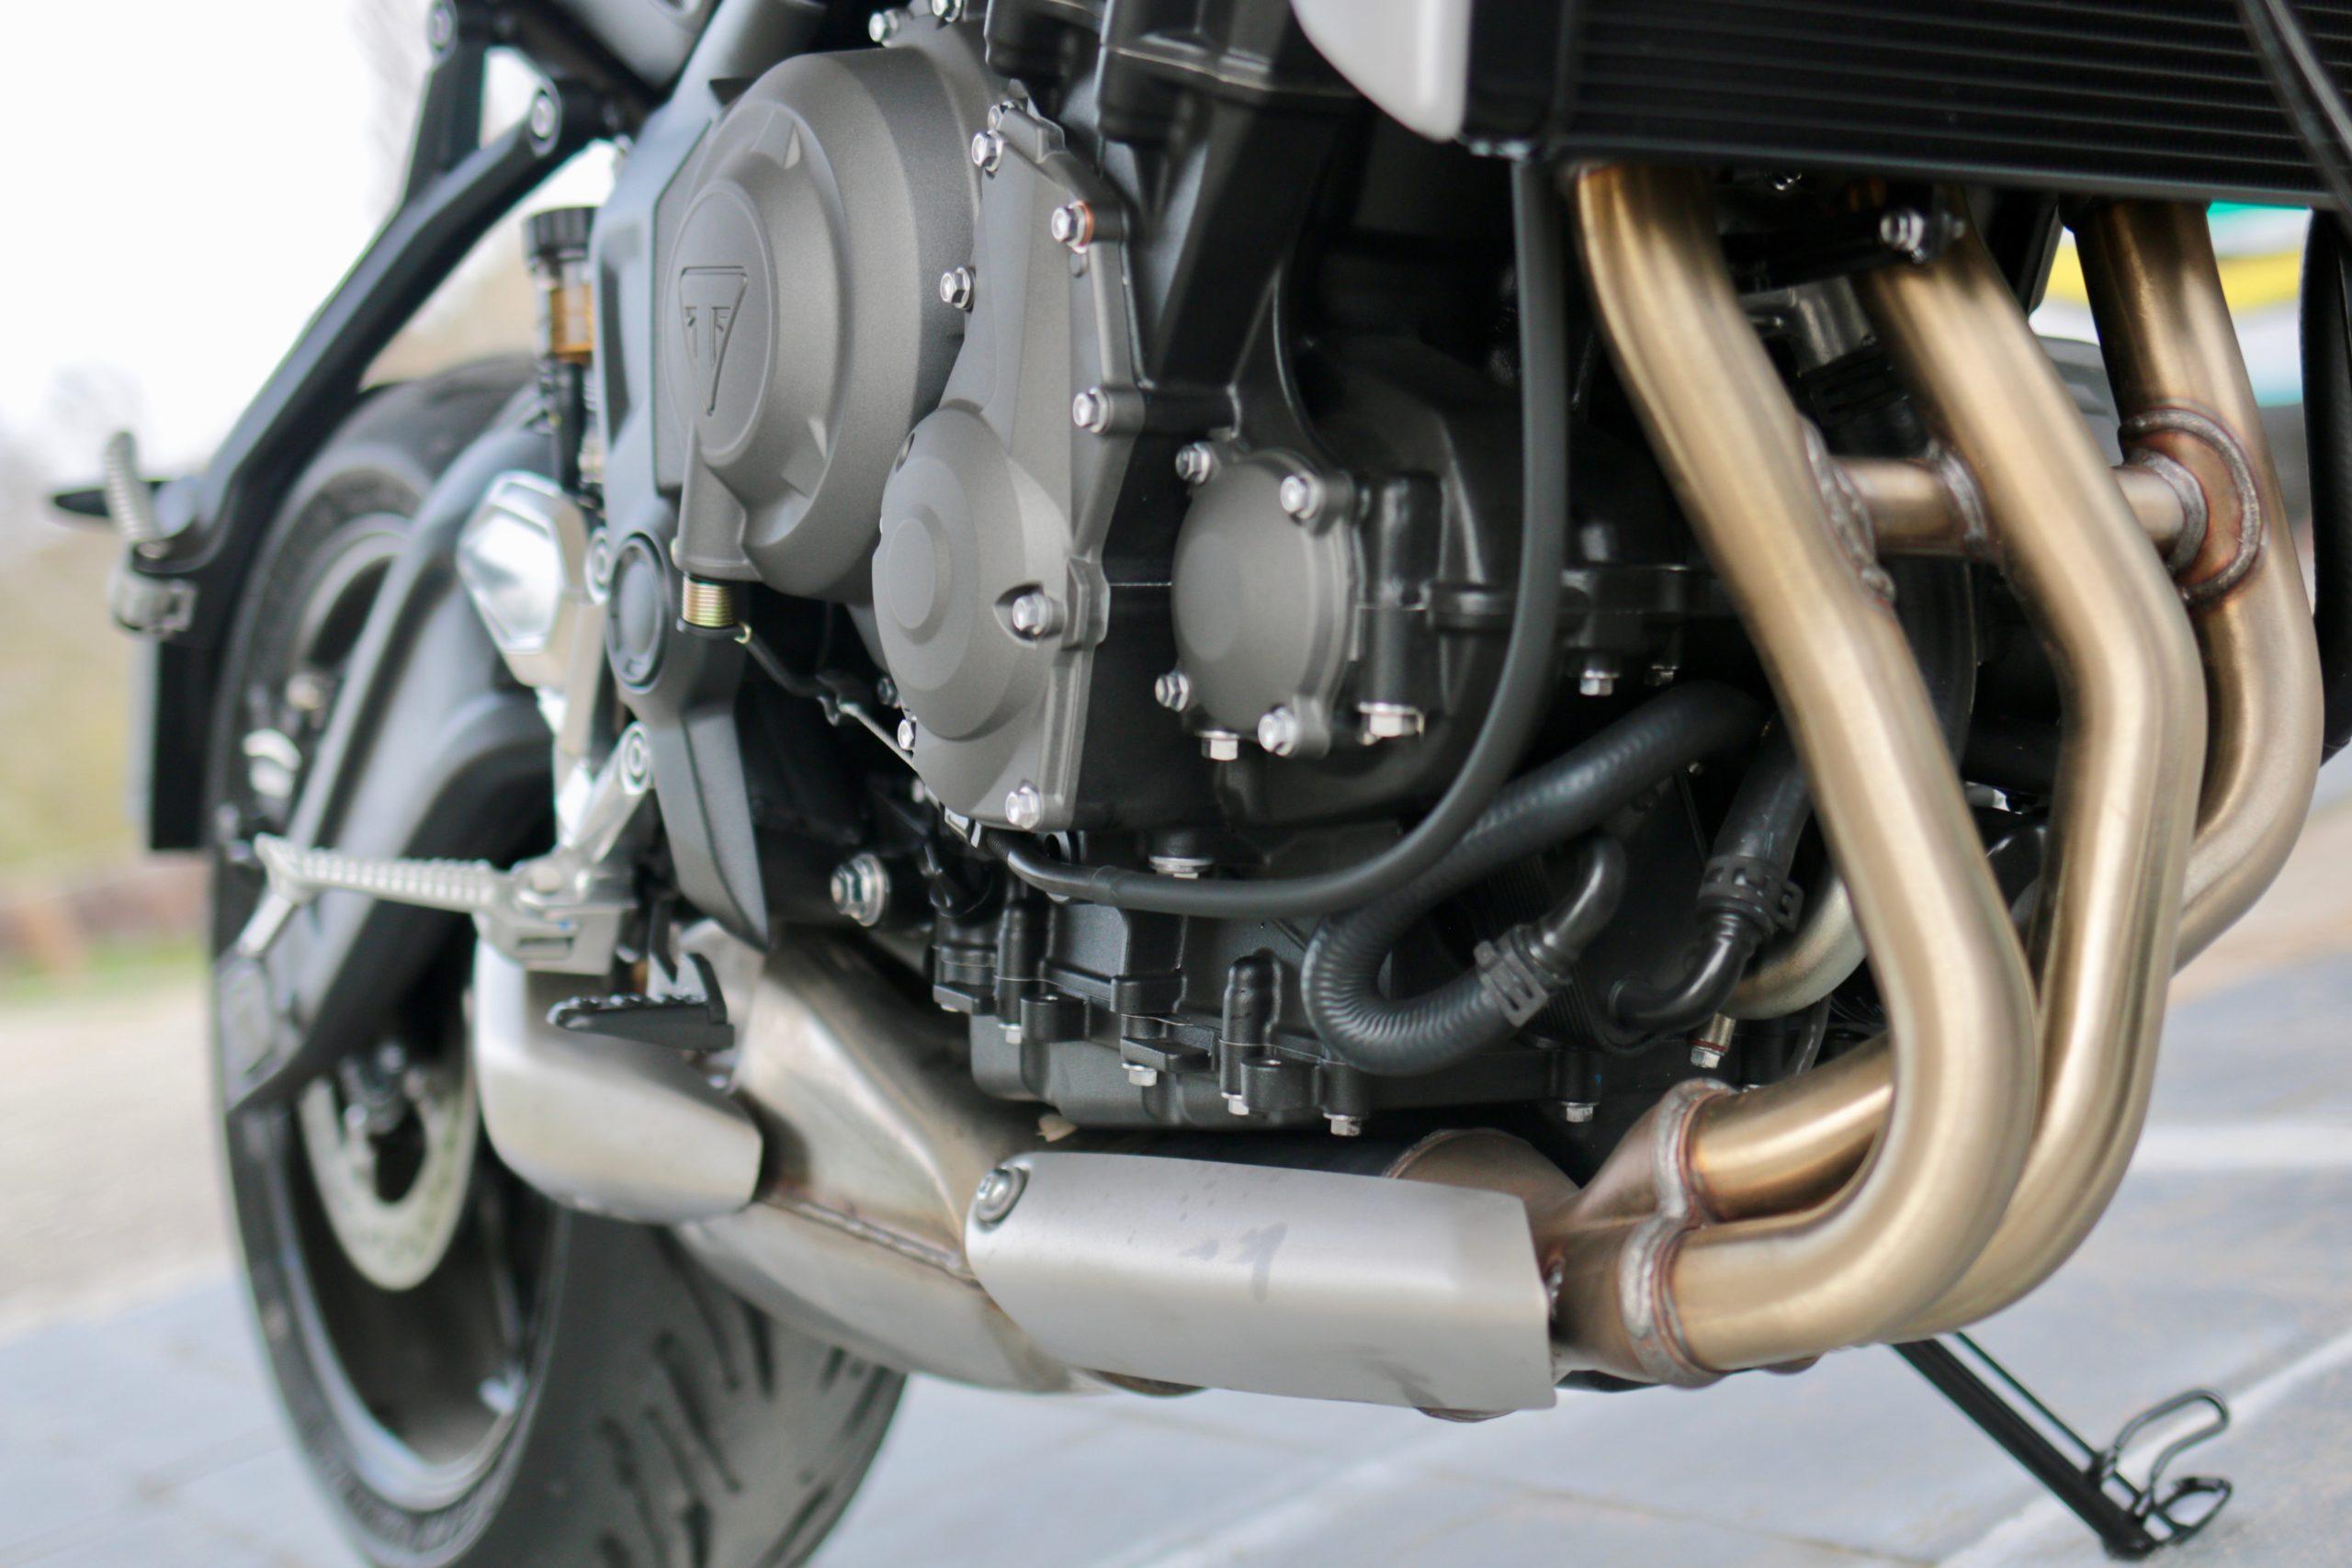 Triumph Trident 660